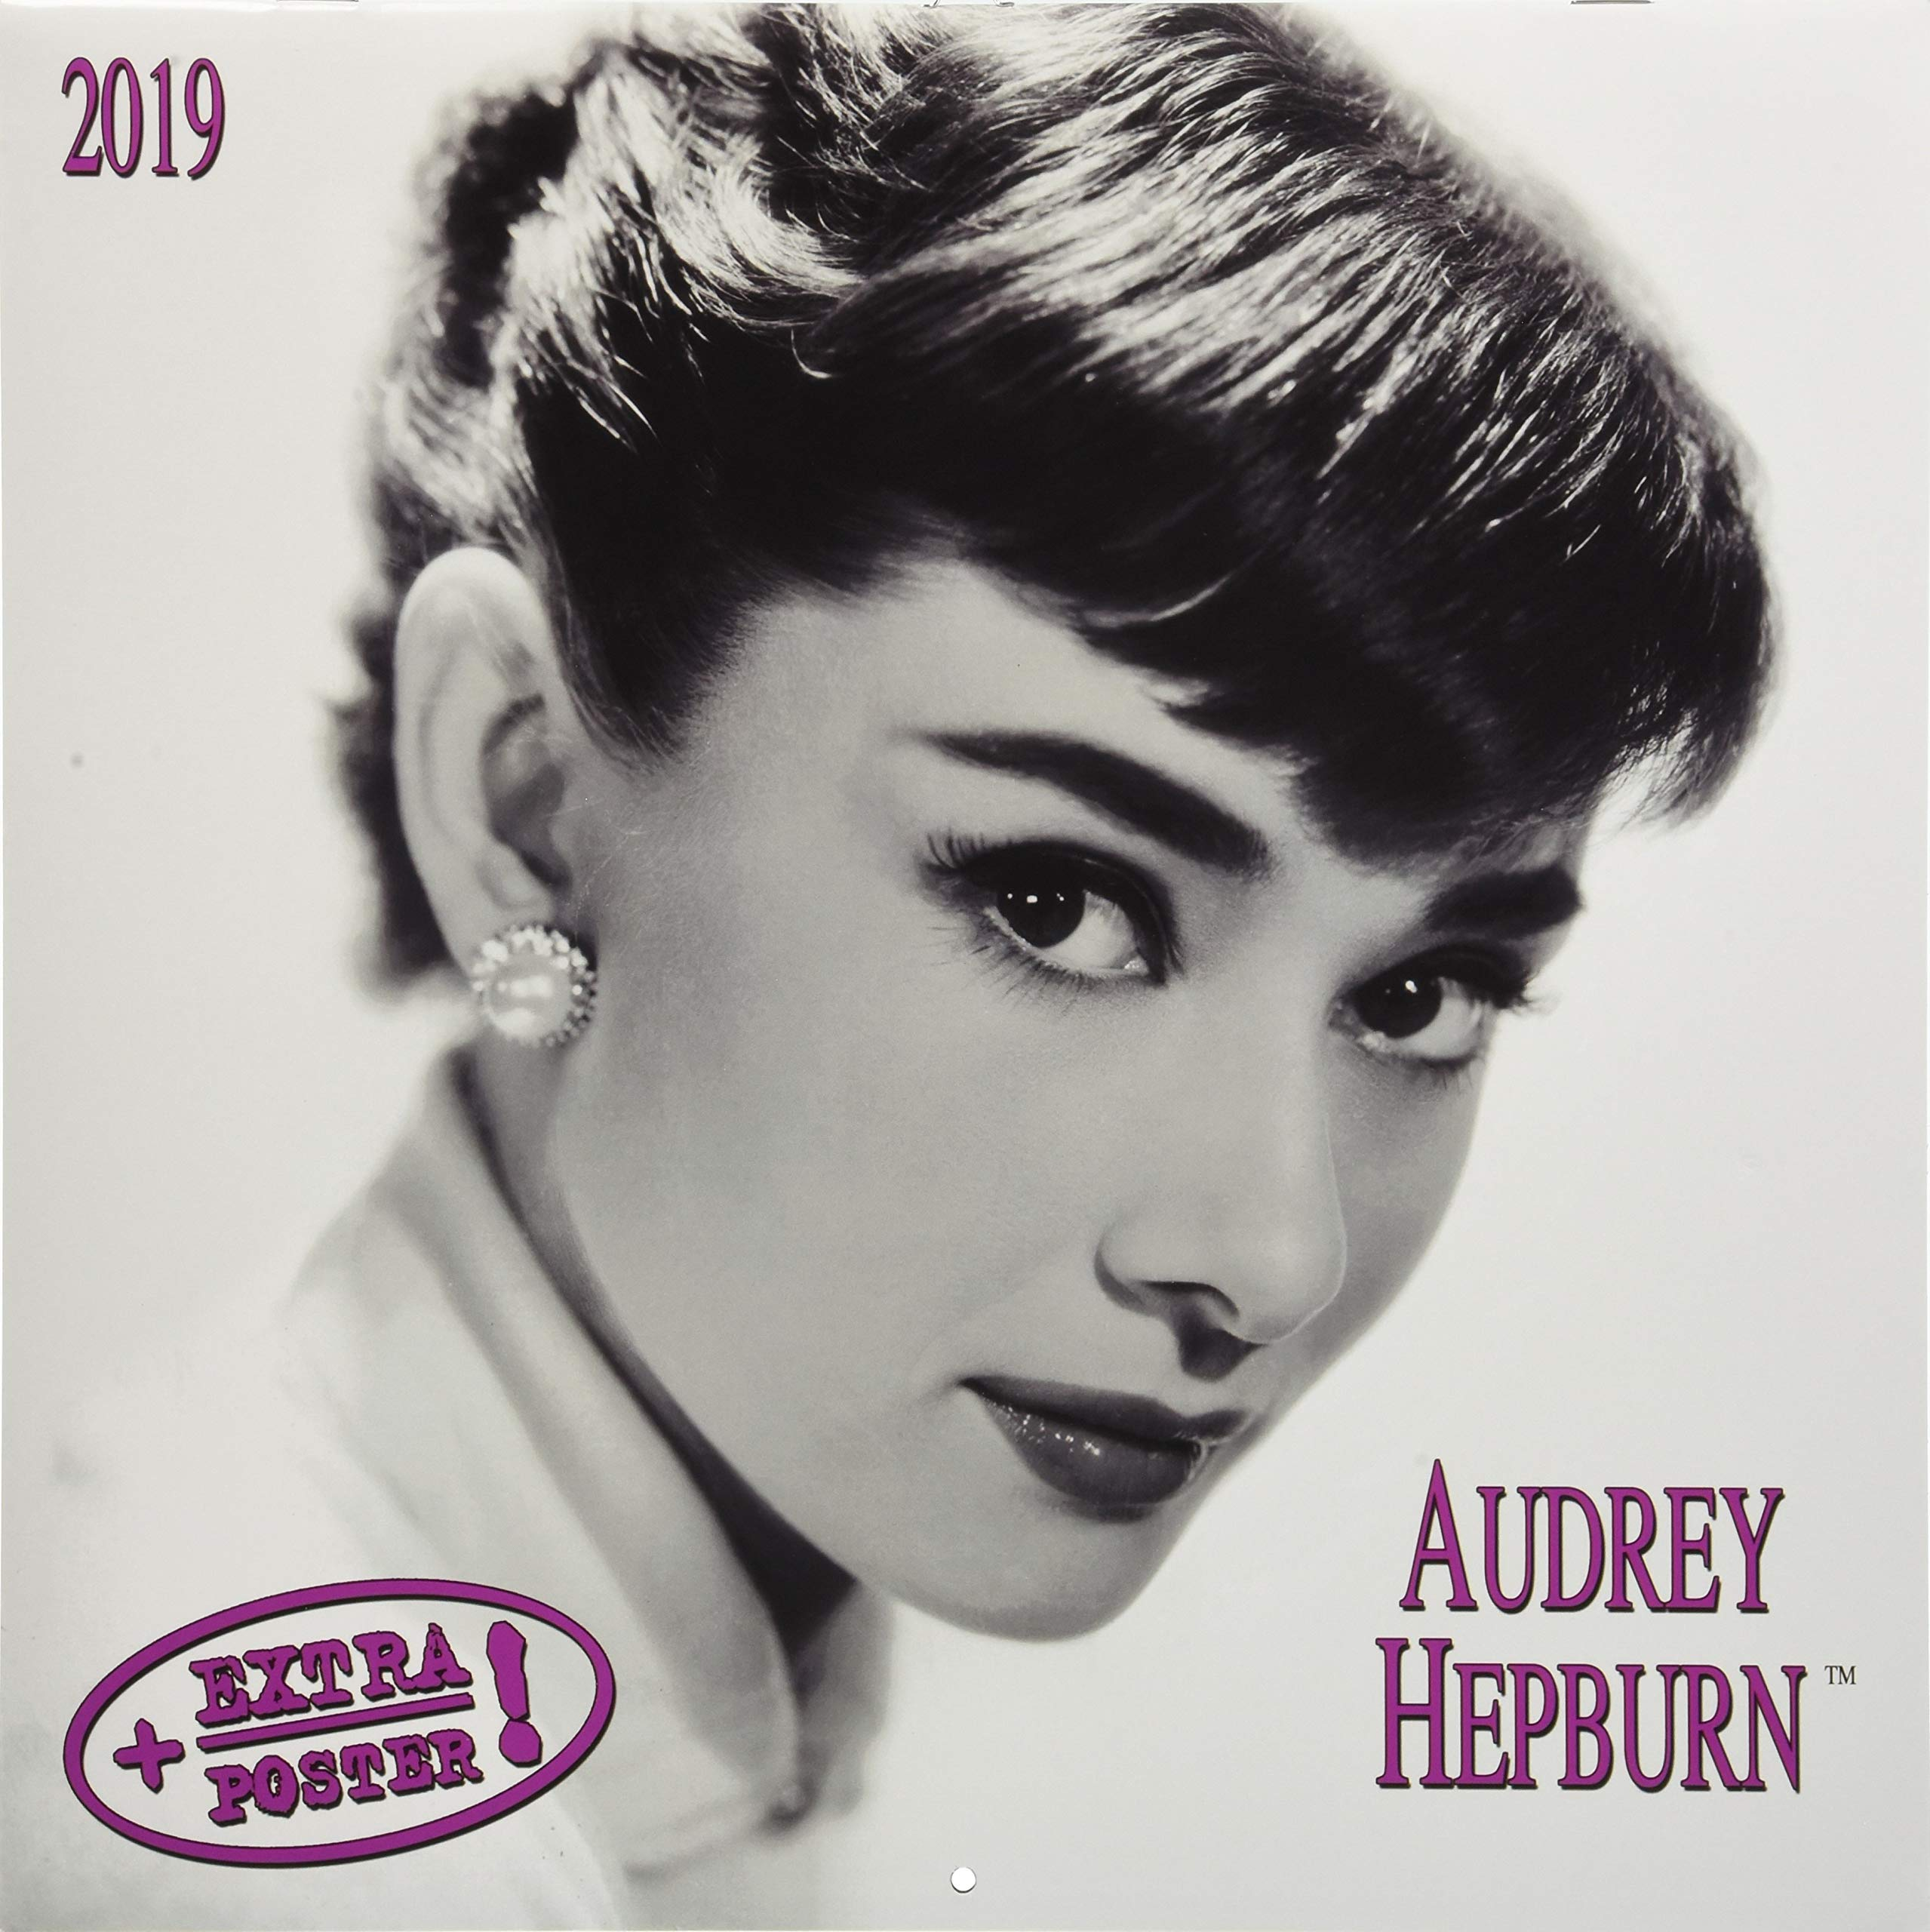 Audrey Hepburn 2019 Kalender 2019 Artwork Extra Amazonde